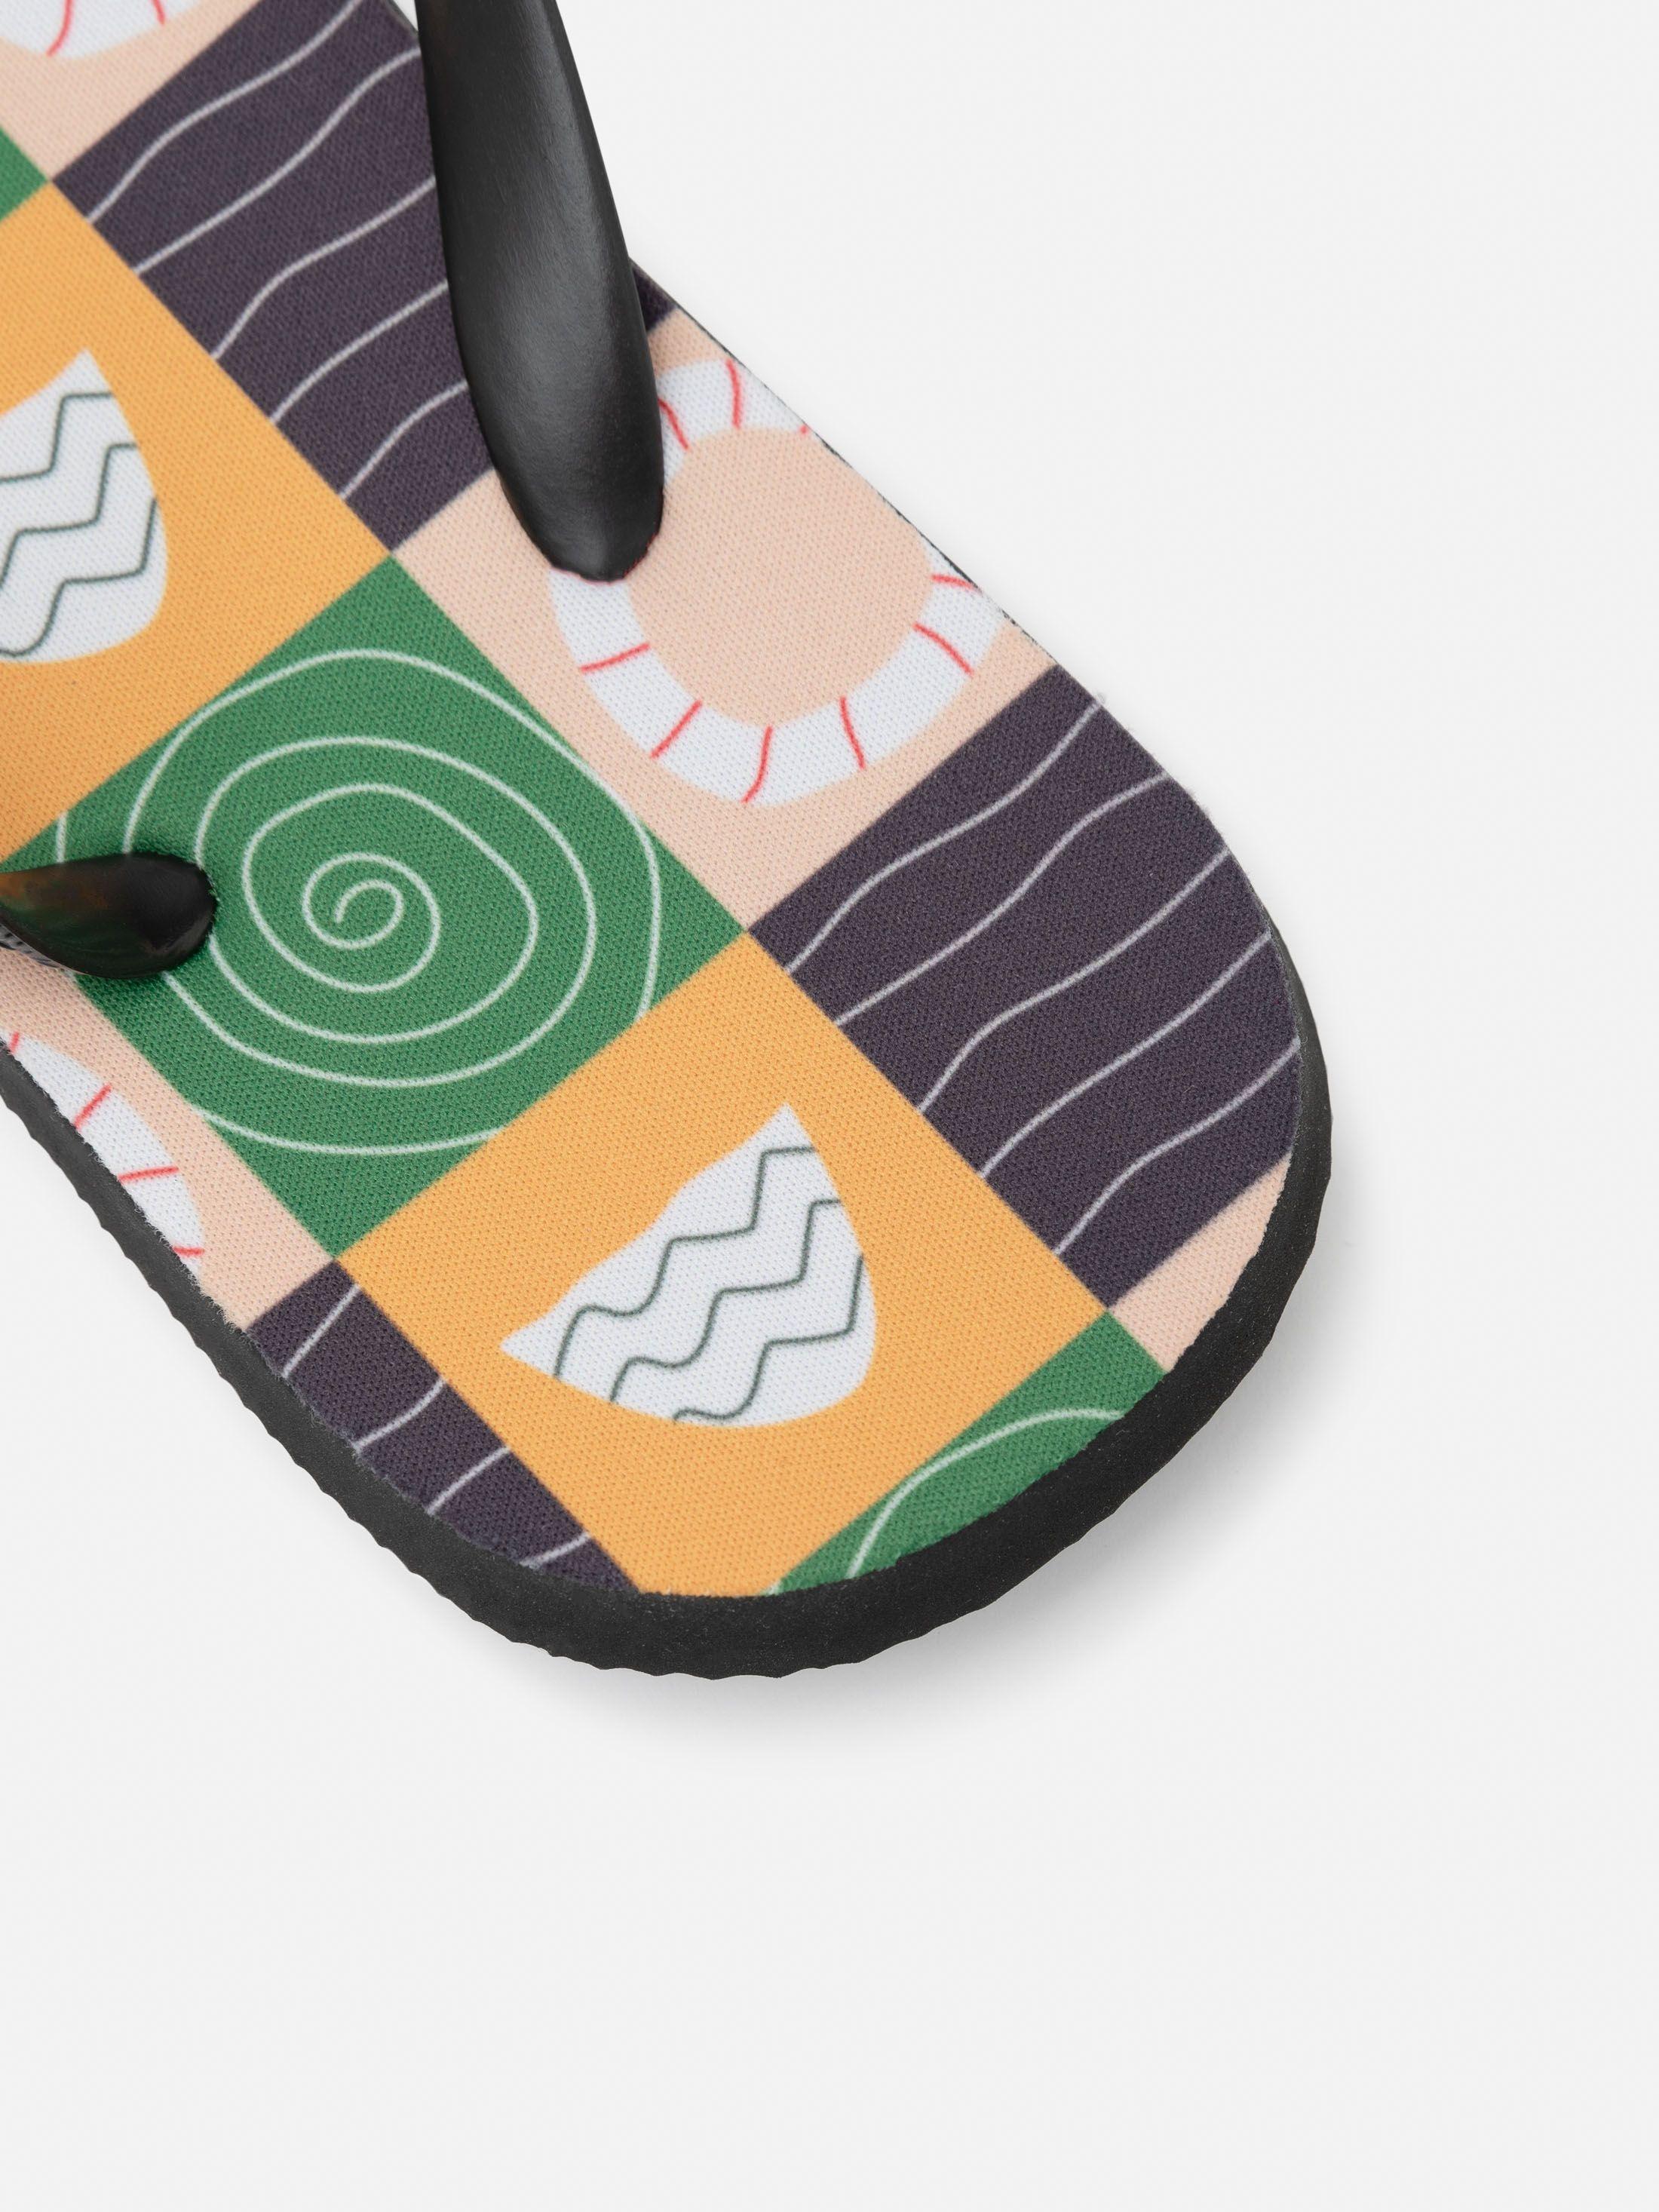 Design your own kids printed flip flops